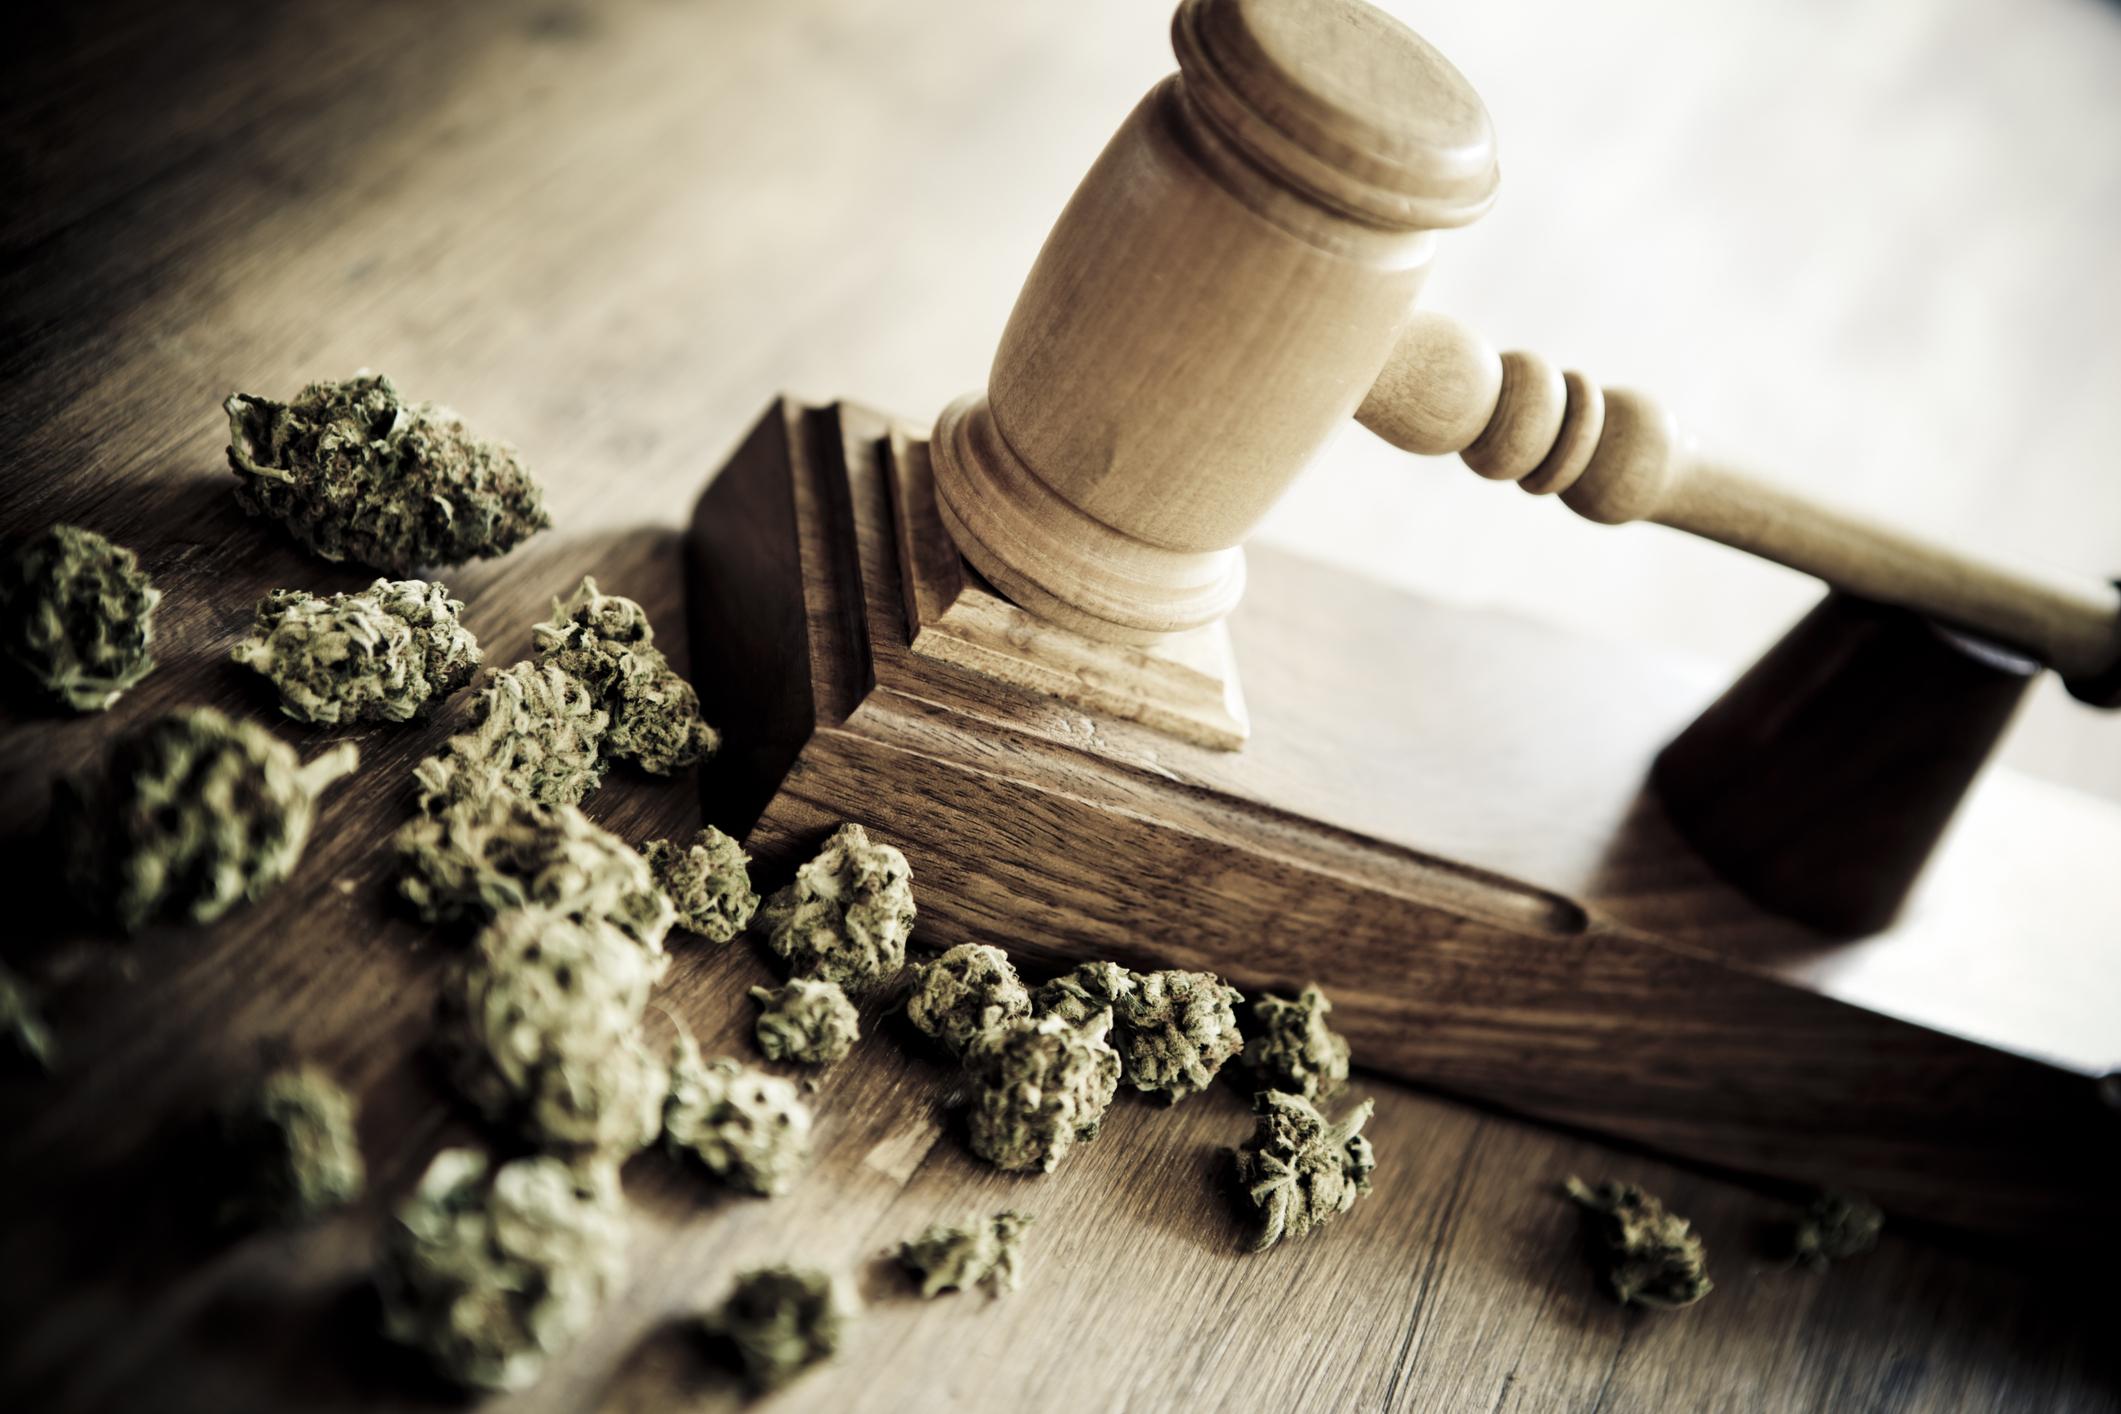 Marijuana buds sitting next to a judge's gavel.